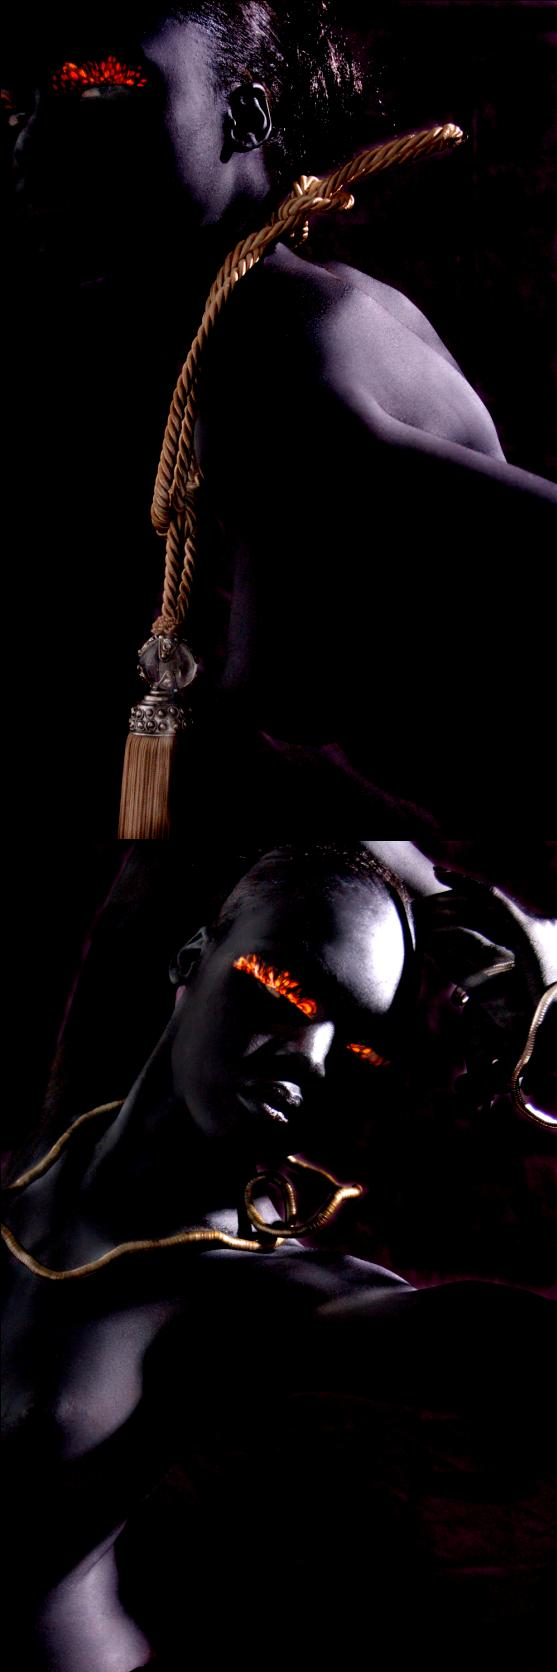 INHOUSE Studios Dec 11, 2007 M. Duval Bird Woman2 (tribal shoot)